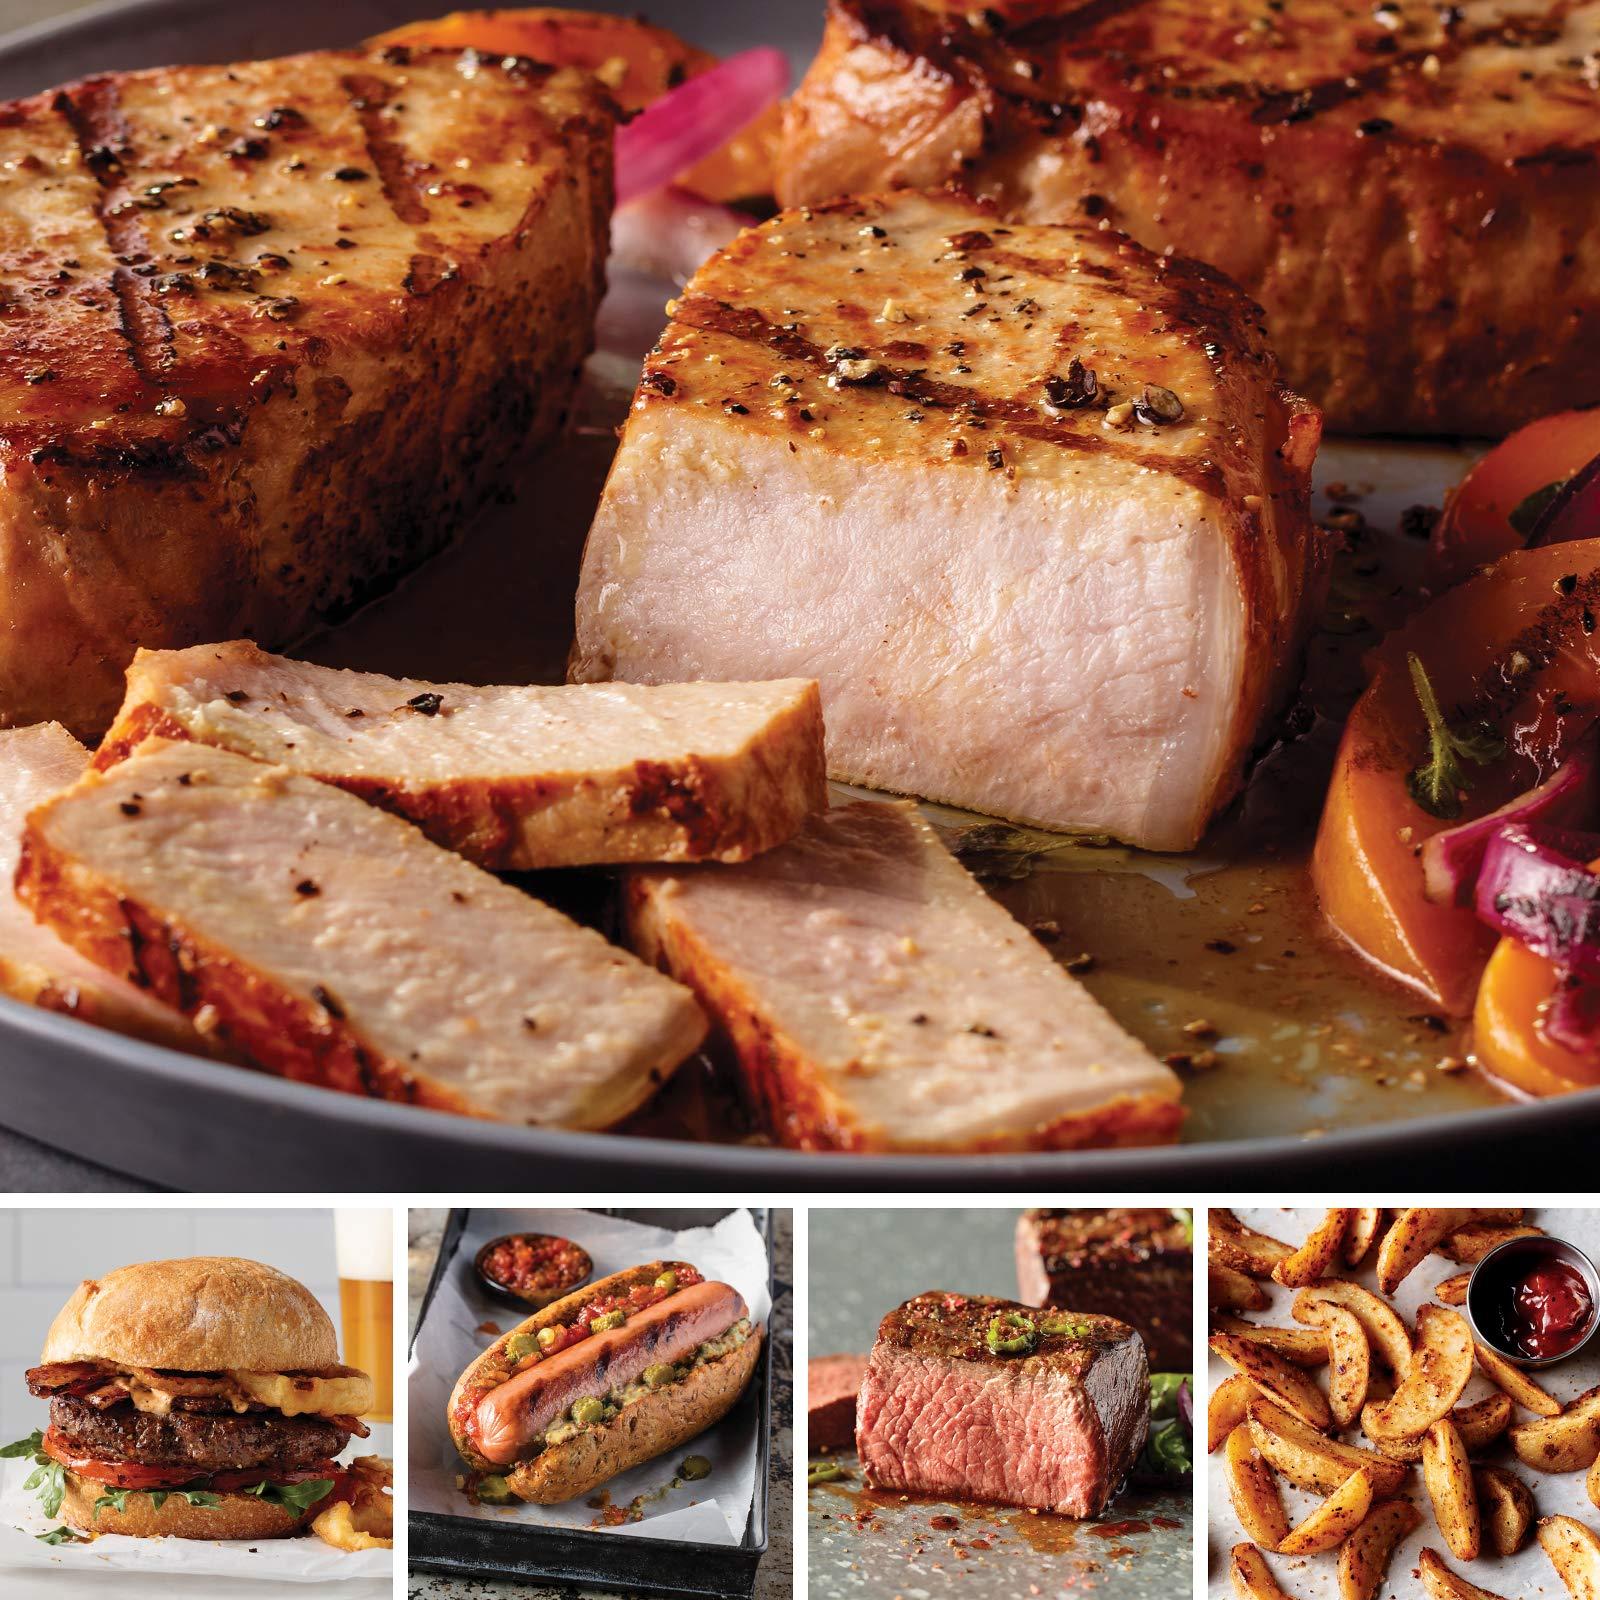 Omaha Steaks Most Wonderful Time Sampler (13-Piece with Top Sirloins, Boneless Pork Chops, Steak Burgers, Jumbo Franks, and Steakhouse Fries) by Omaha Steaks (Image #1)